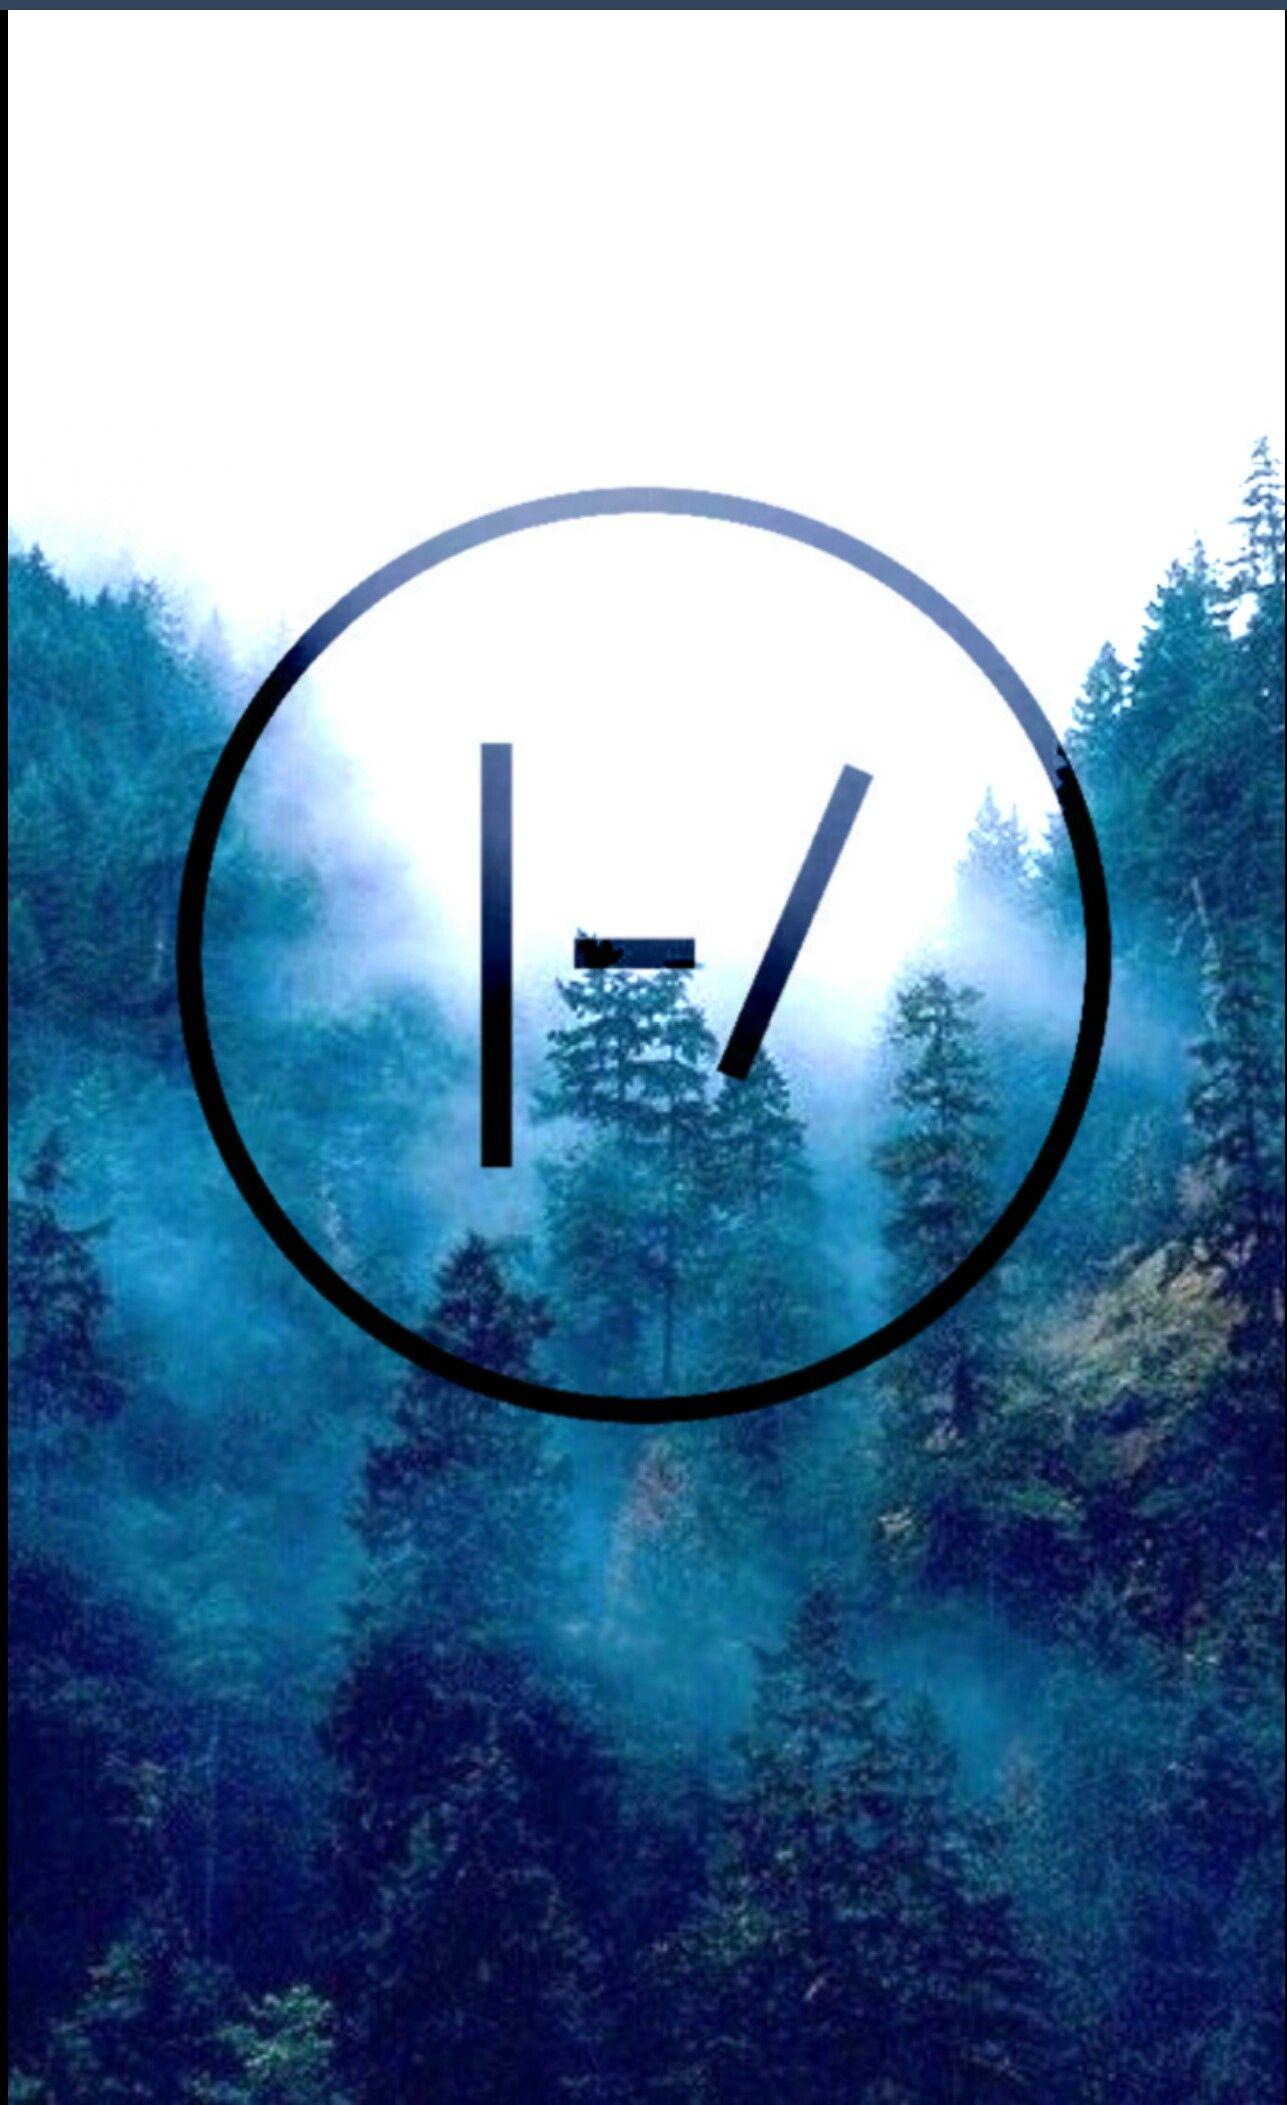 Down In The Forest We Ll Sing A Chorus Twenty One